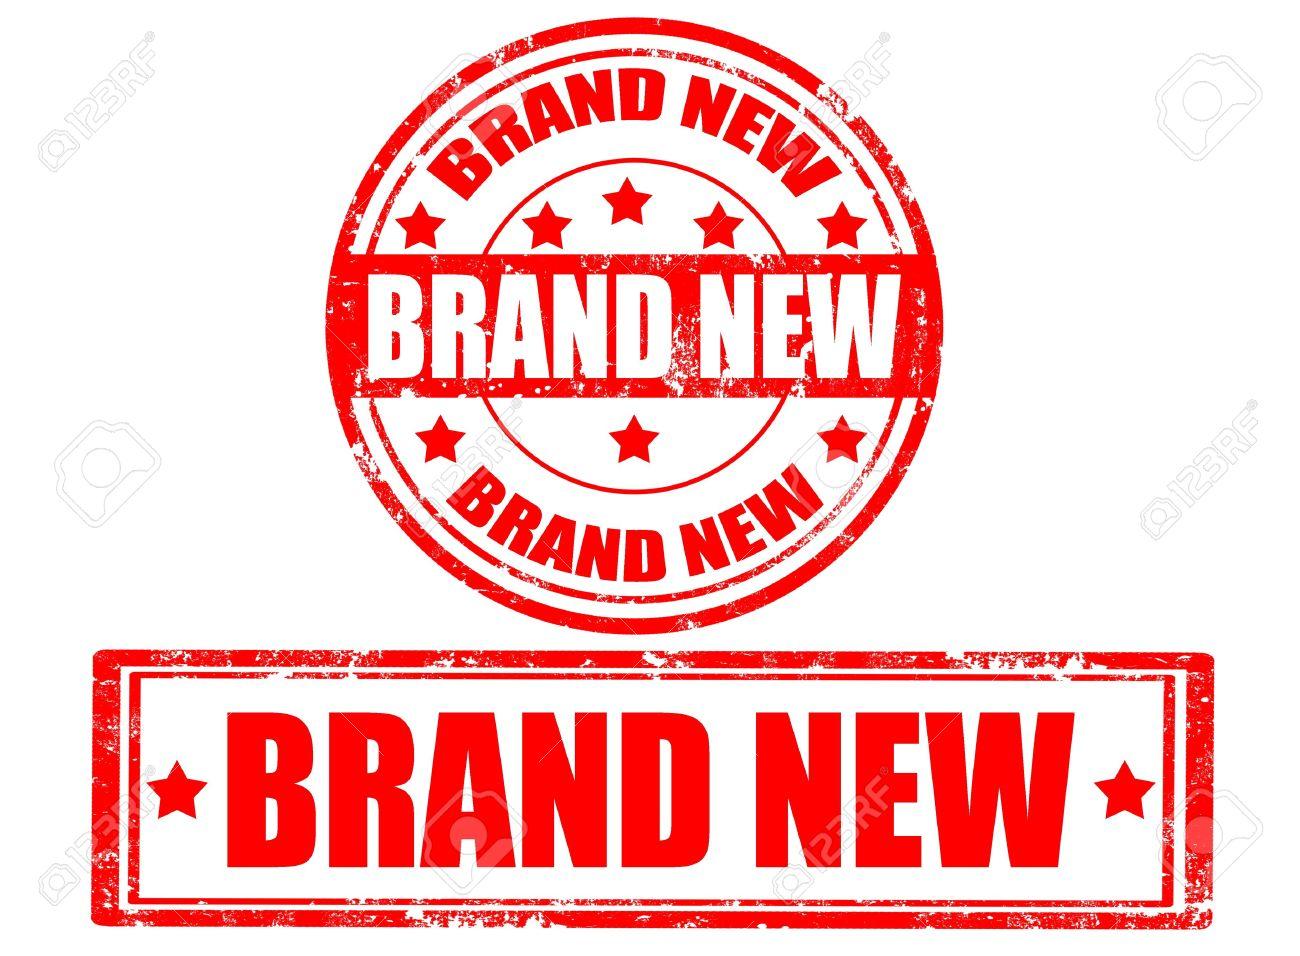 nightclubshop-brand-new-product-arrivals-nightclub-bar-promo-supplies.jpg